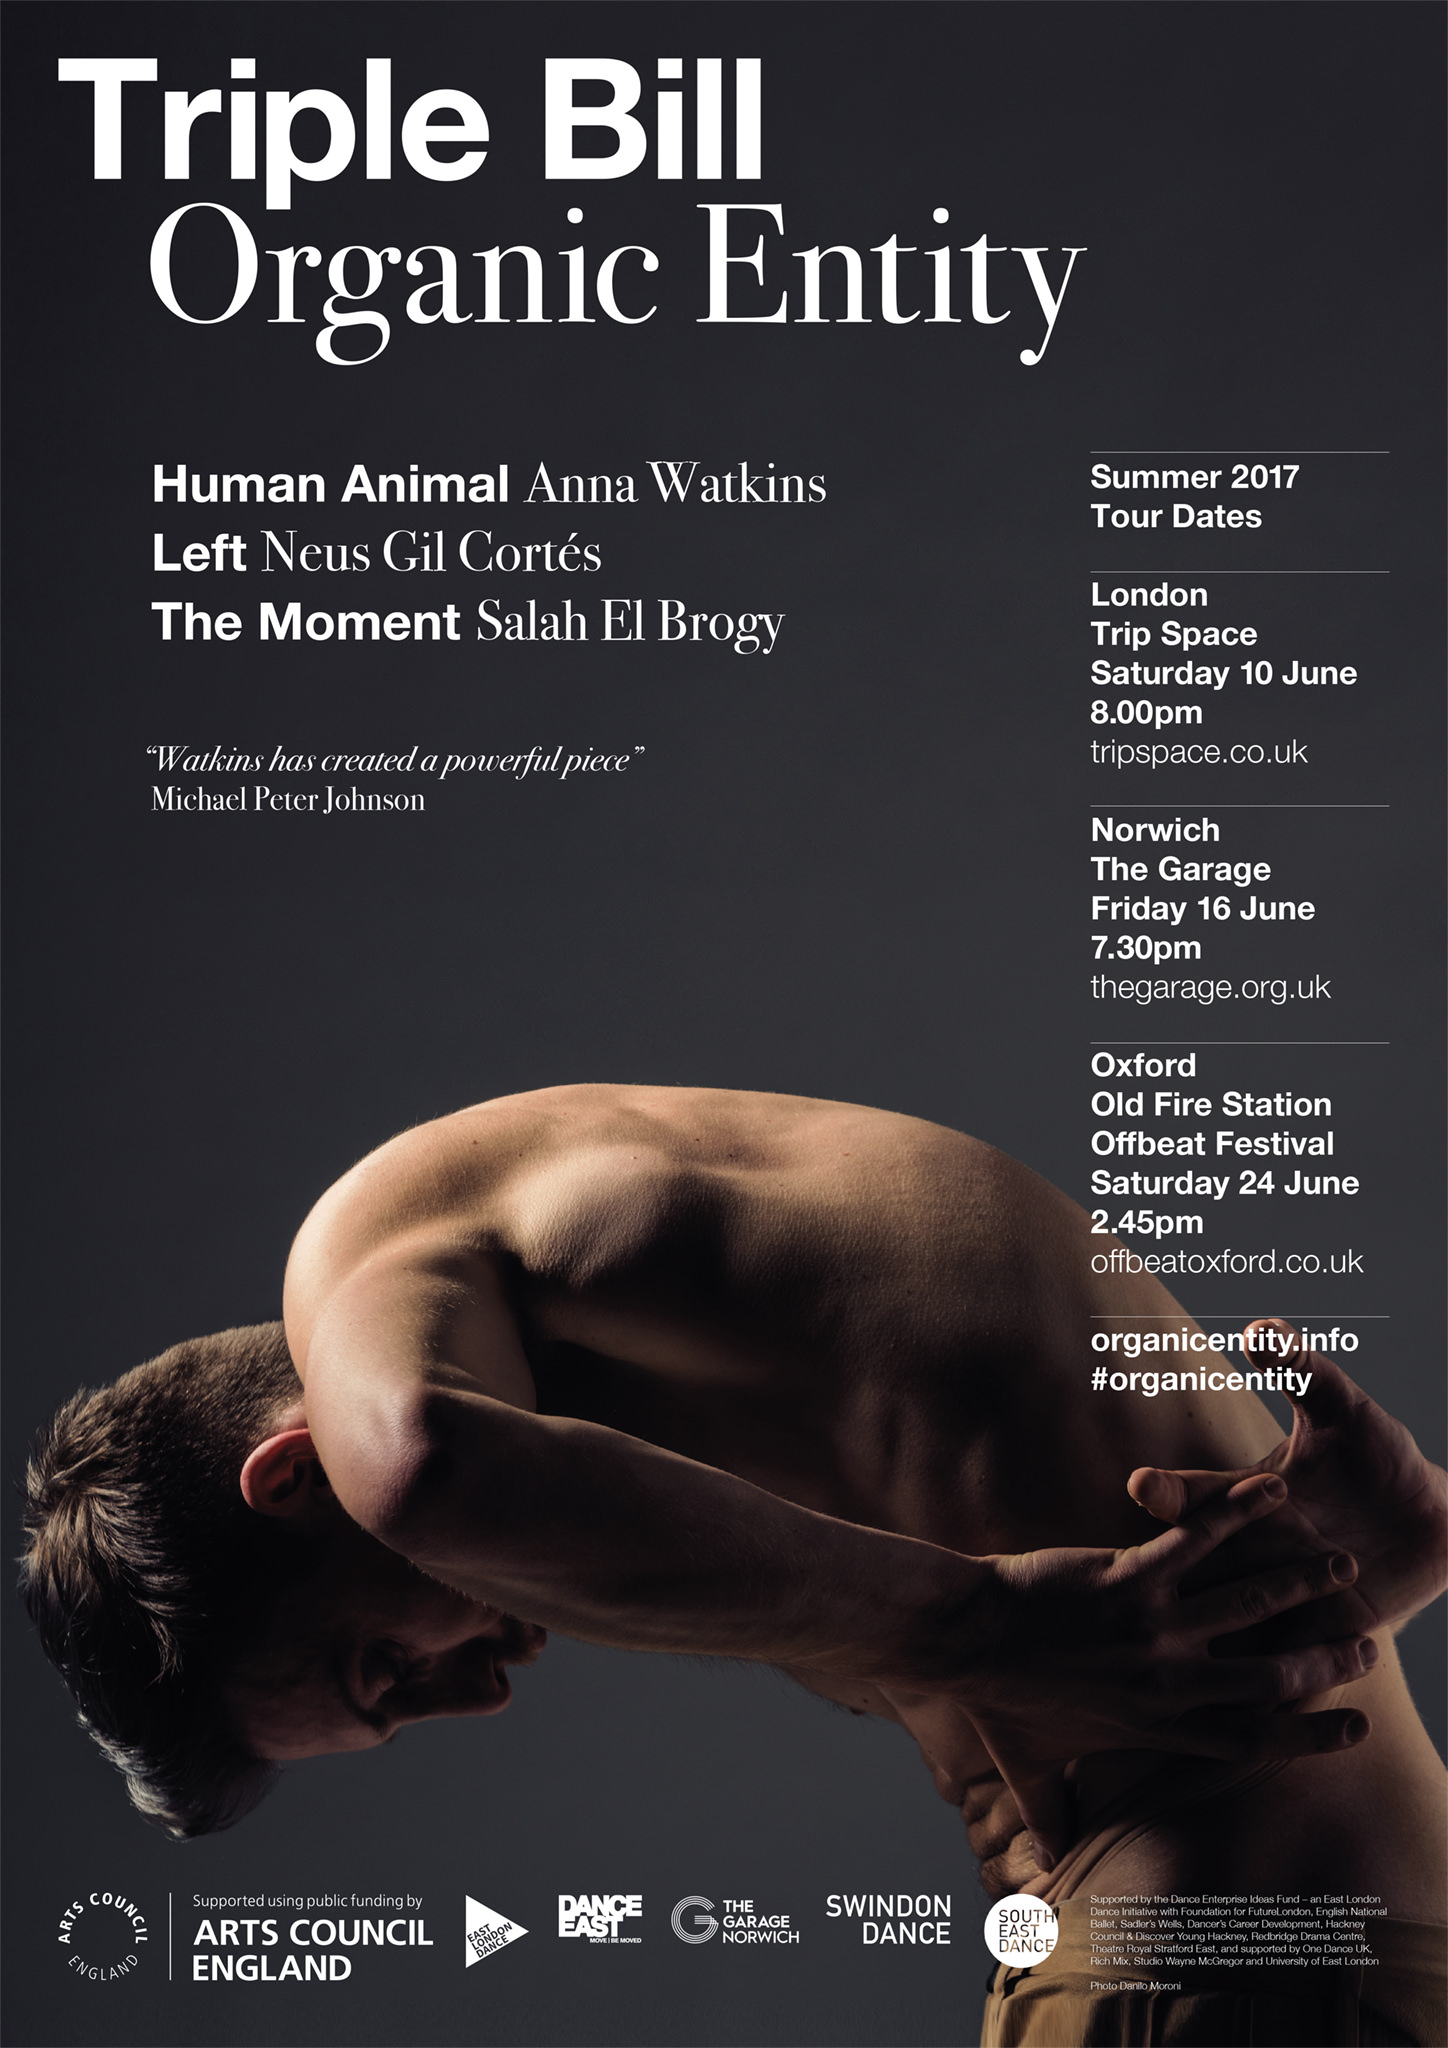 Triple_Bill_Poster3_Organic_Entity_photo_Danilo_Moroni.jpg